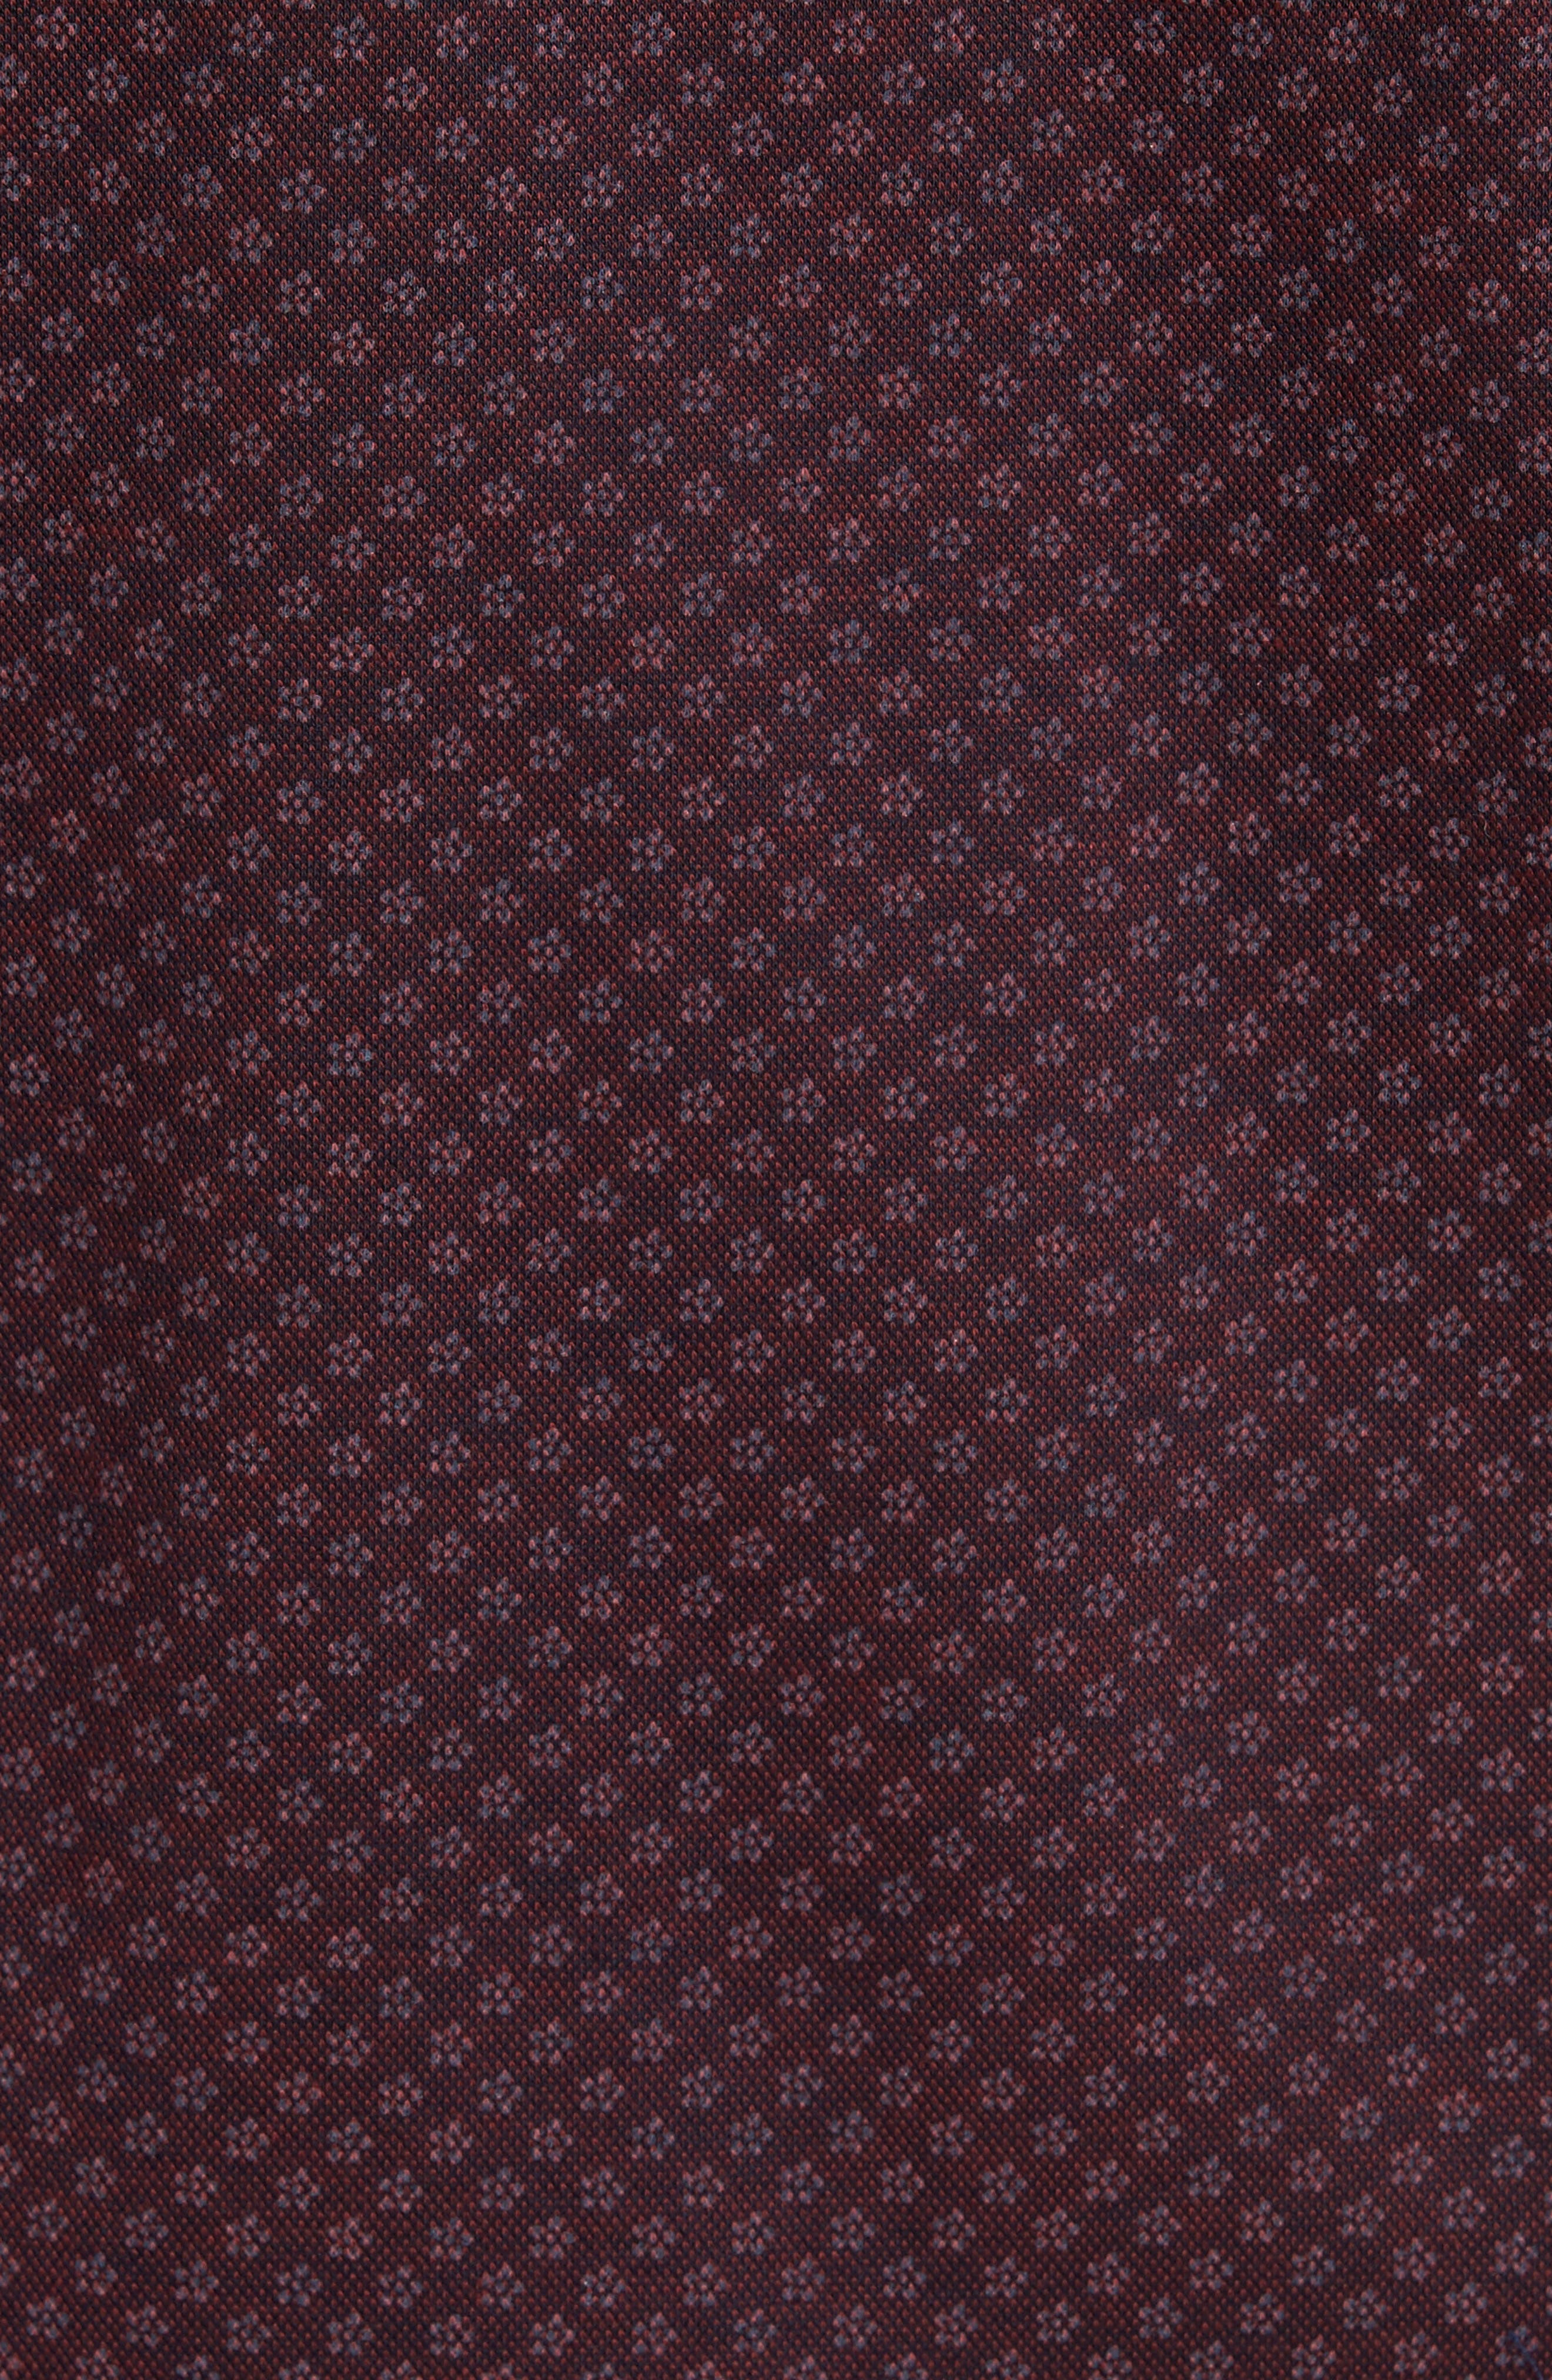 Paul&Shark Floral Print Knit Sports Shirt,                             Alternate thumbnail 5, color,                             930